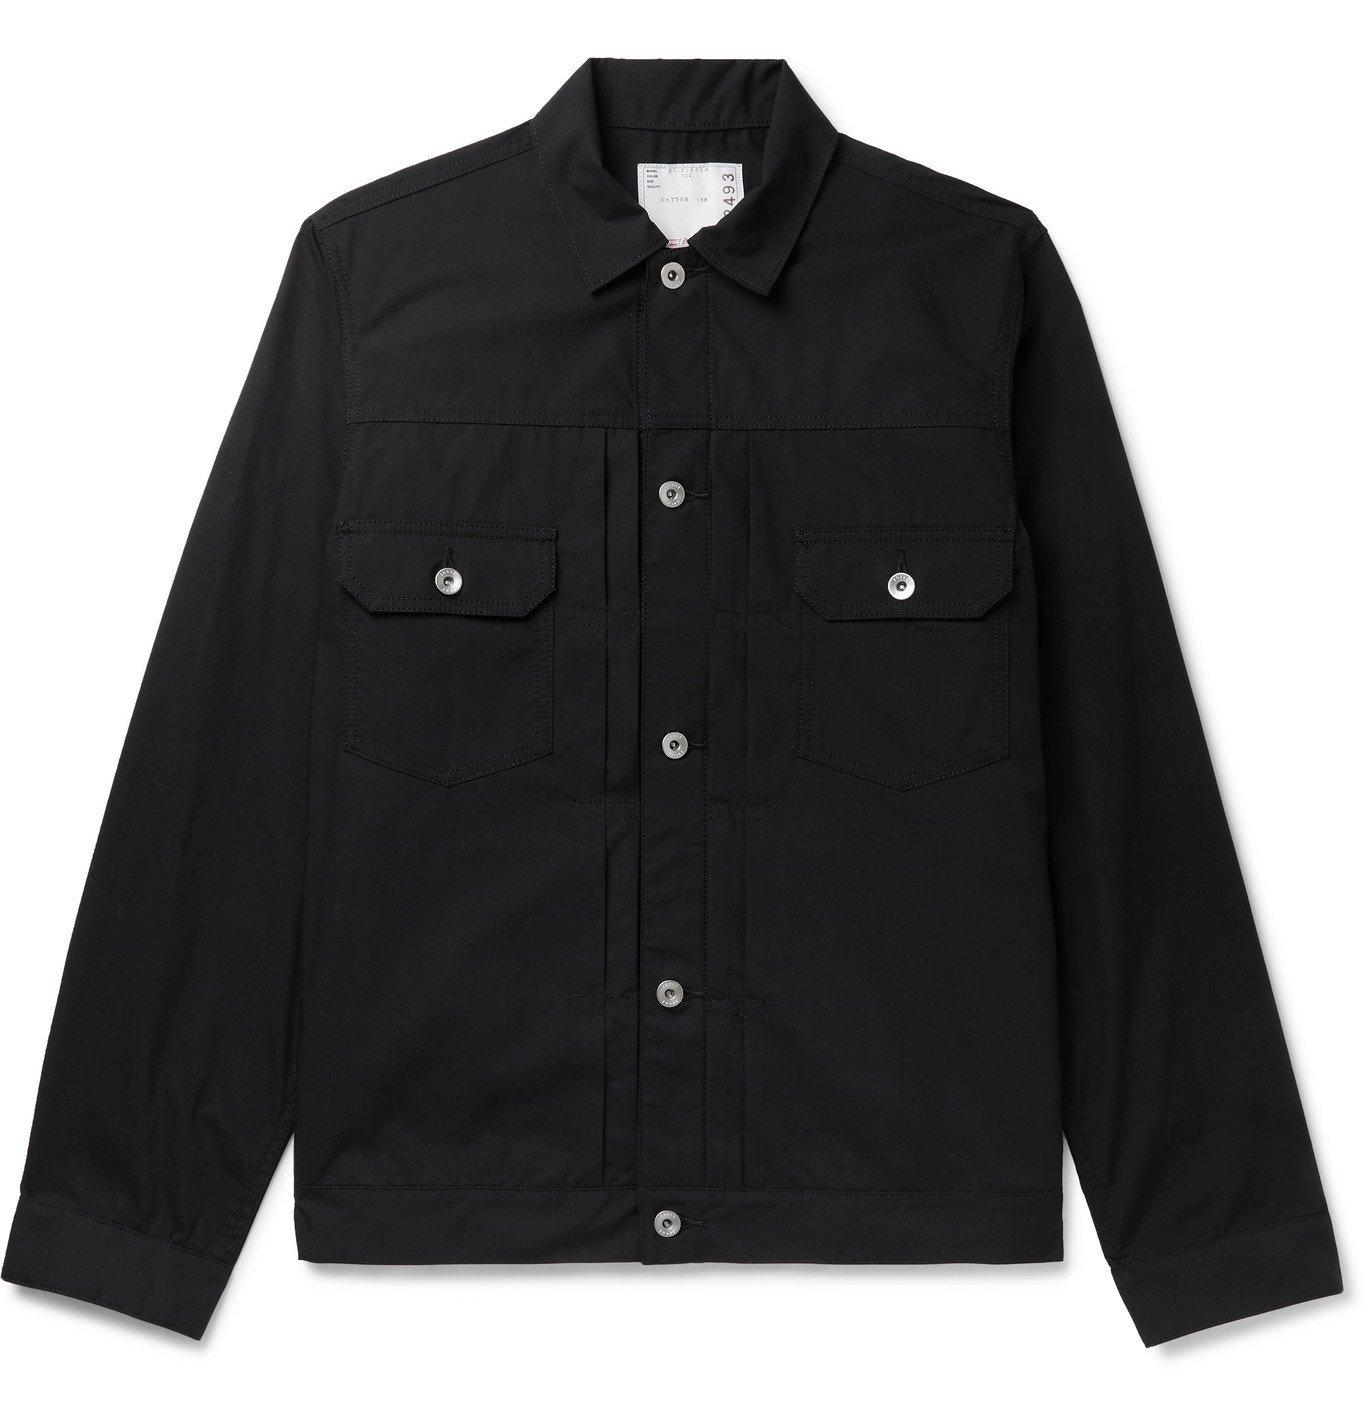 Sacai - Cotton Blouson Jacket - Black